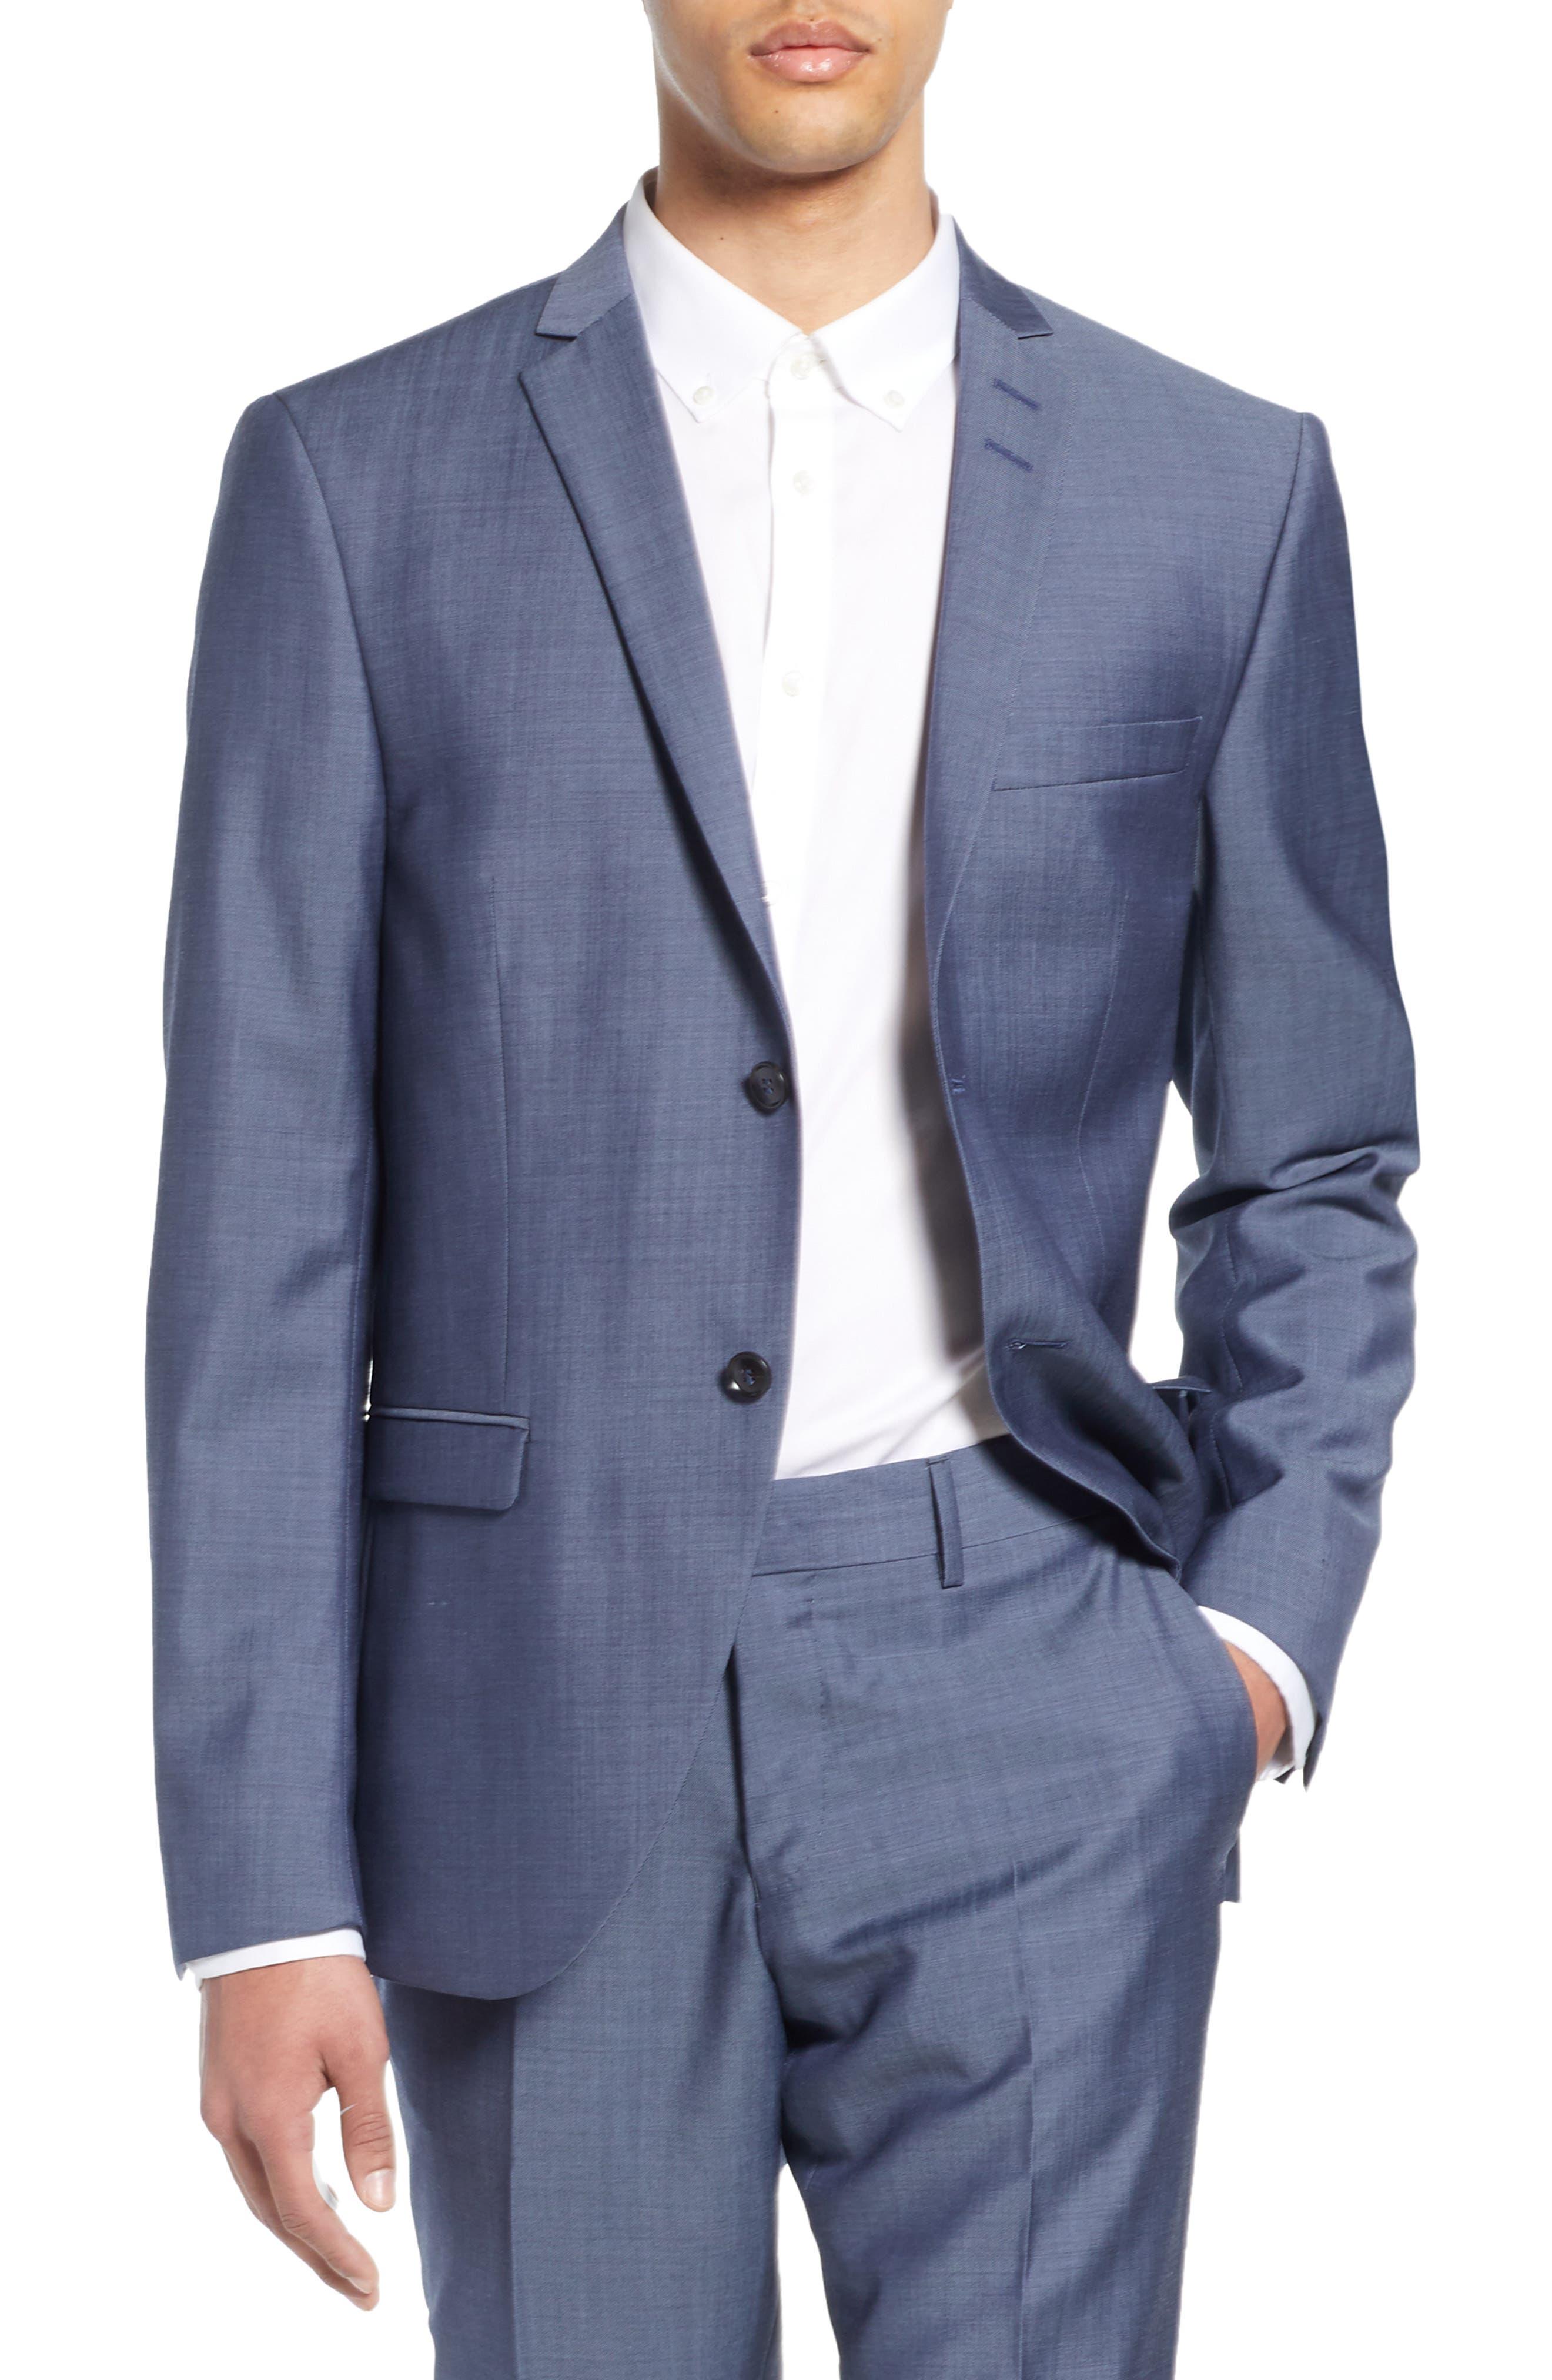 Jile Trim Fit Solid Wool Blazer, Main, color, SOFT BLUE